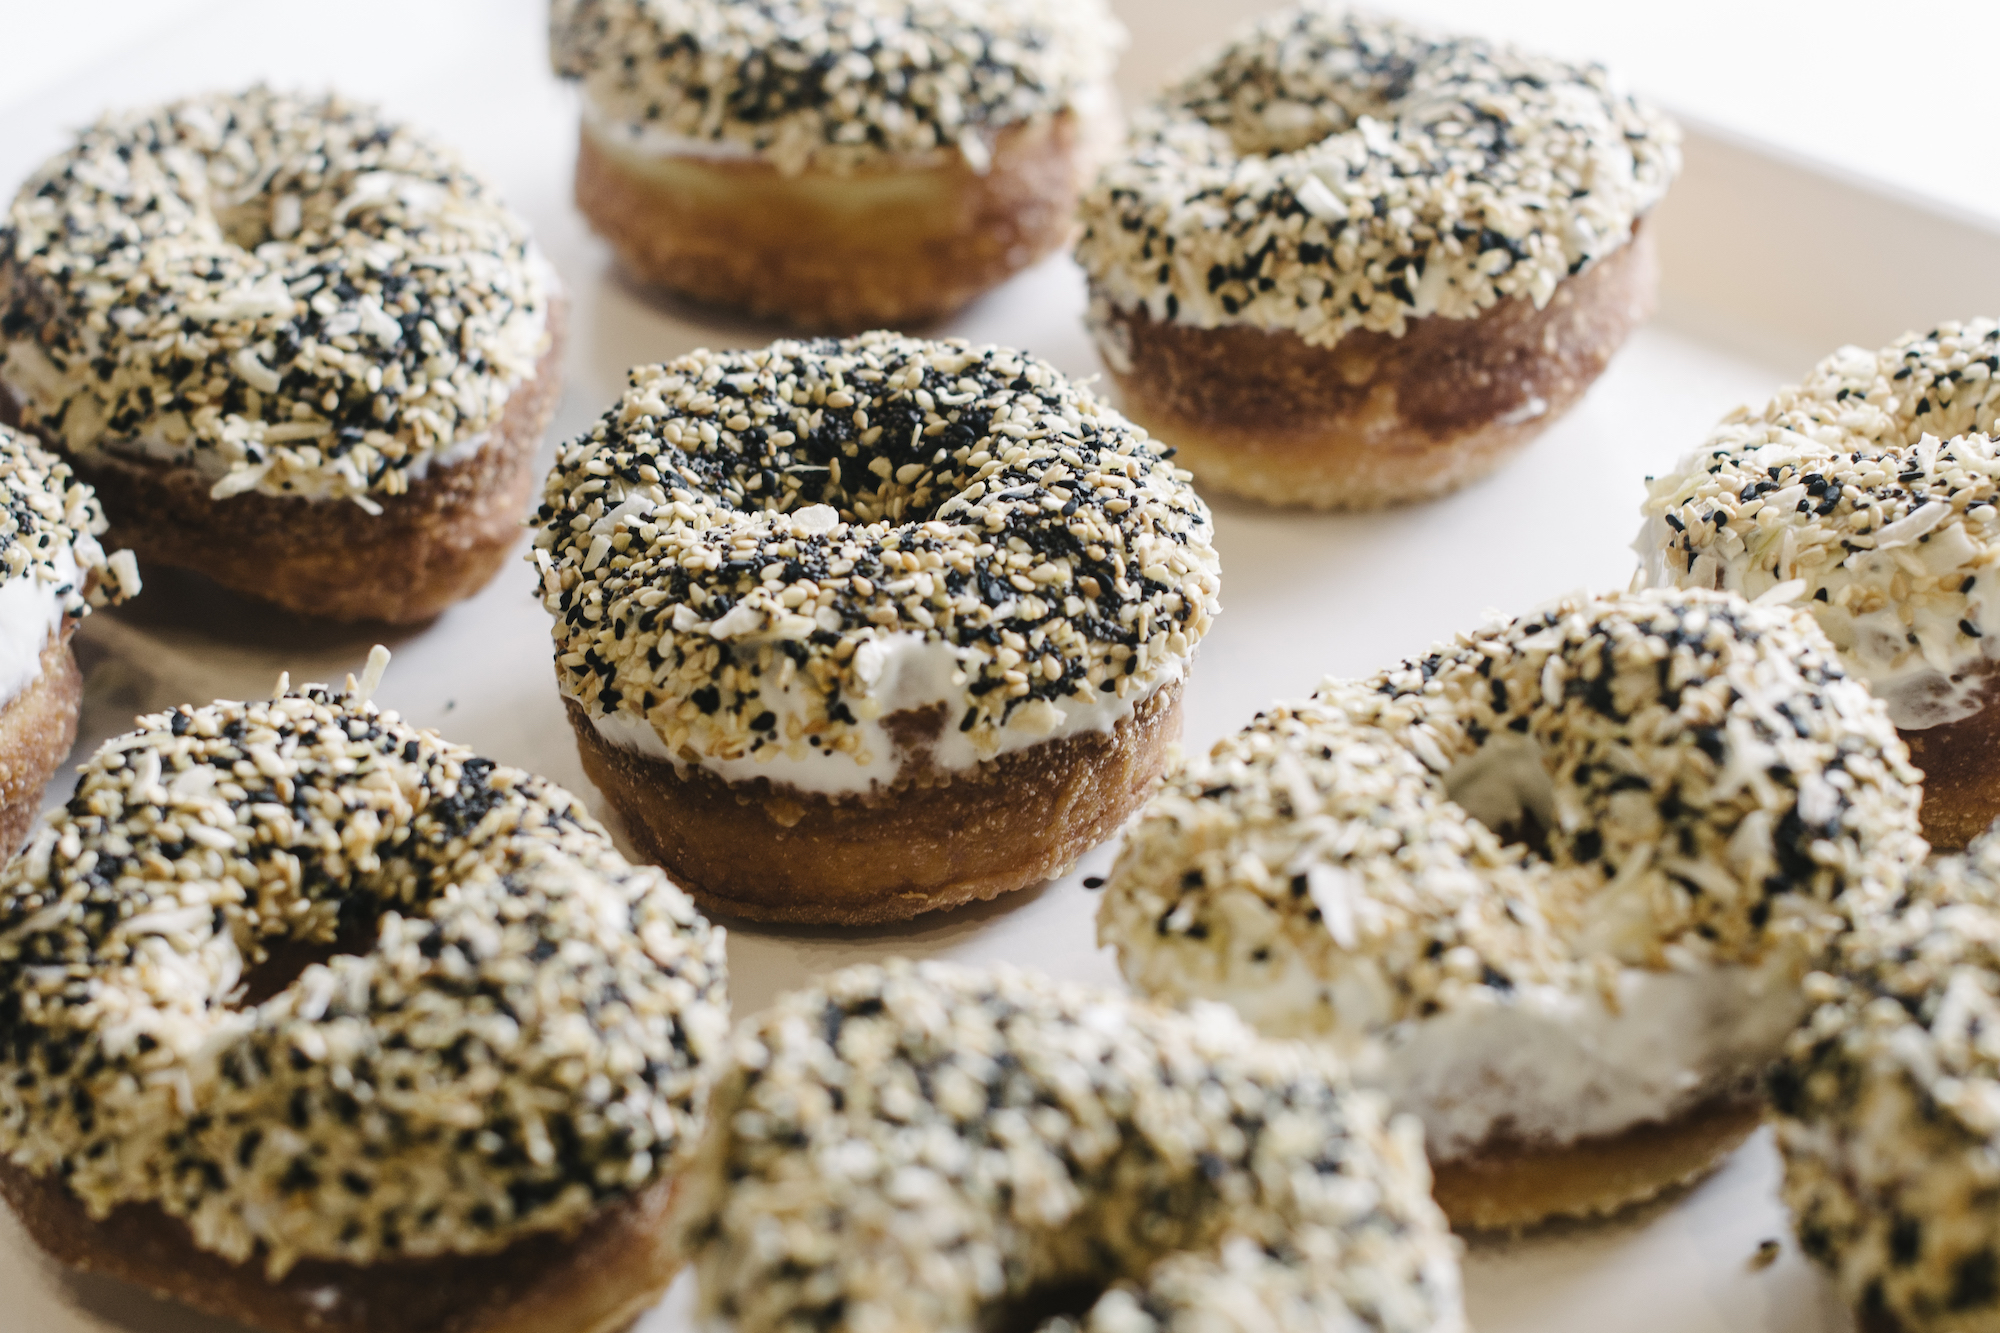 MTC Grindstone Coffee & Donuts 43